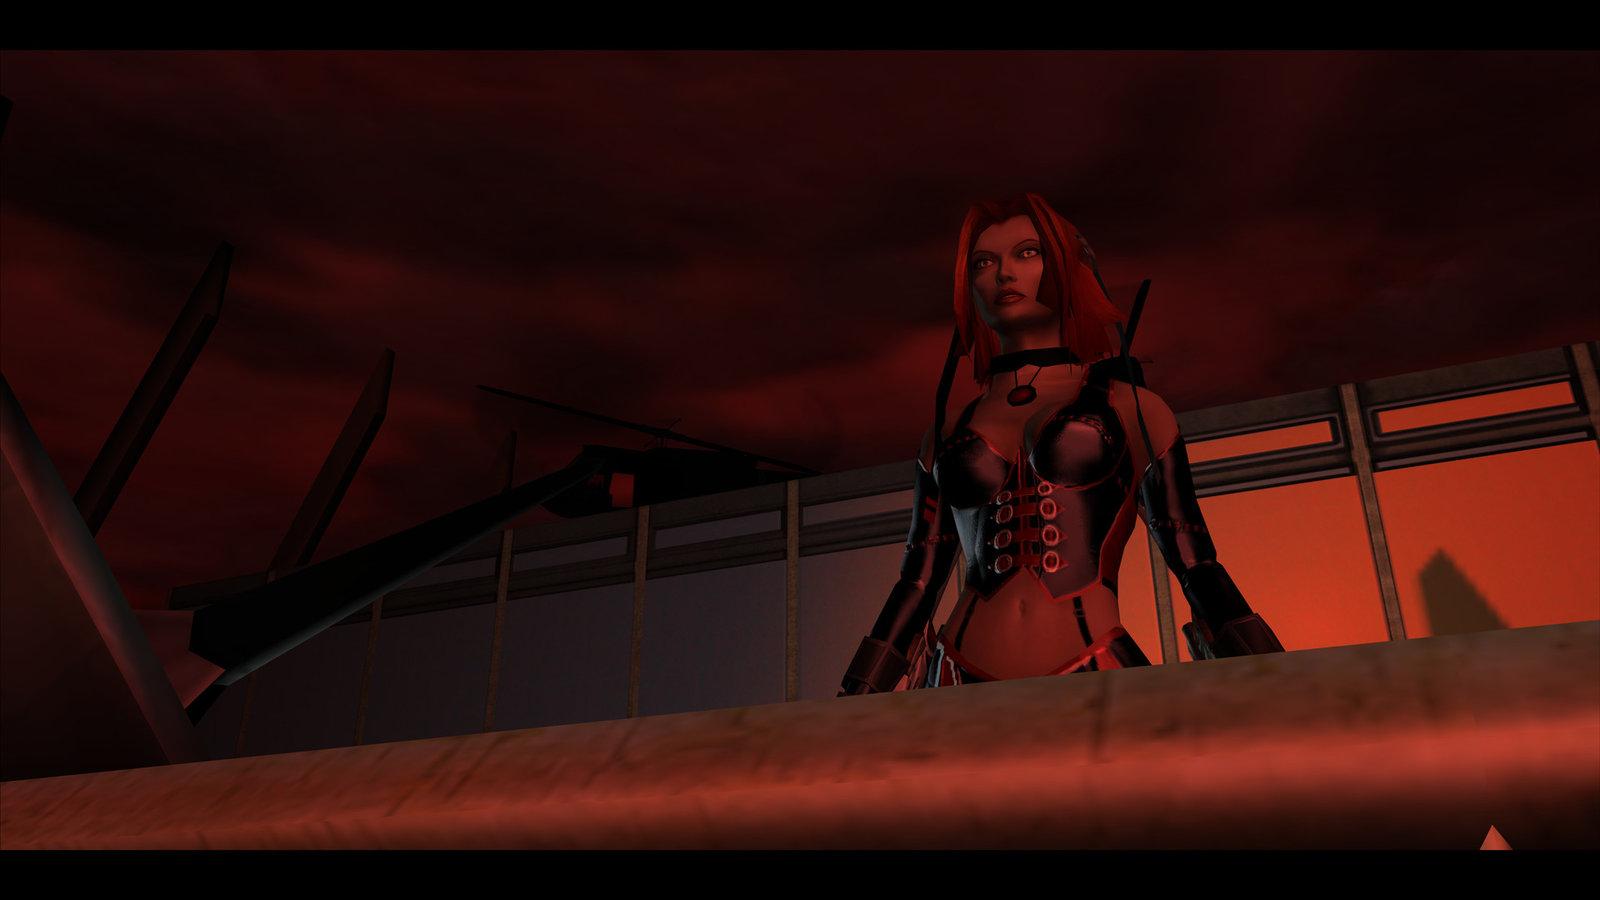 BloodRayne 2: Terminal Cut image 1